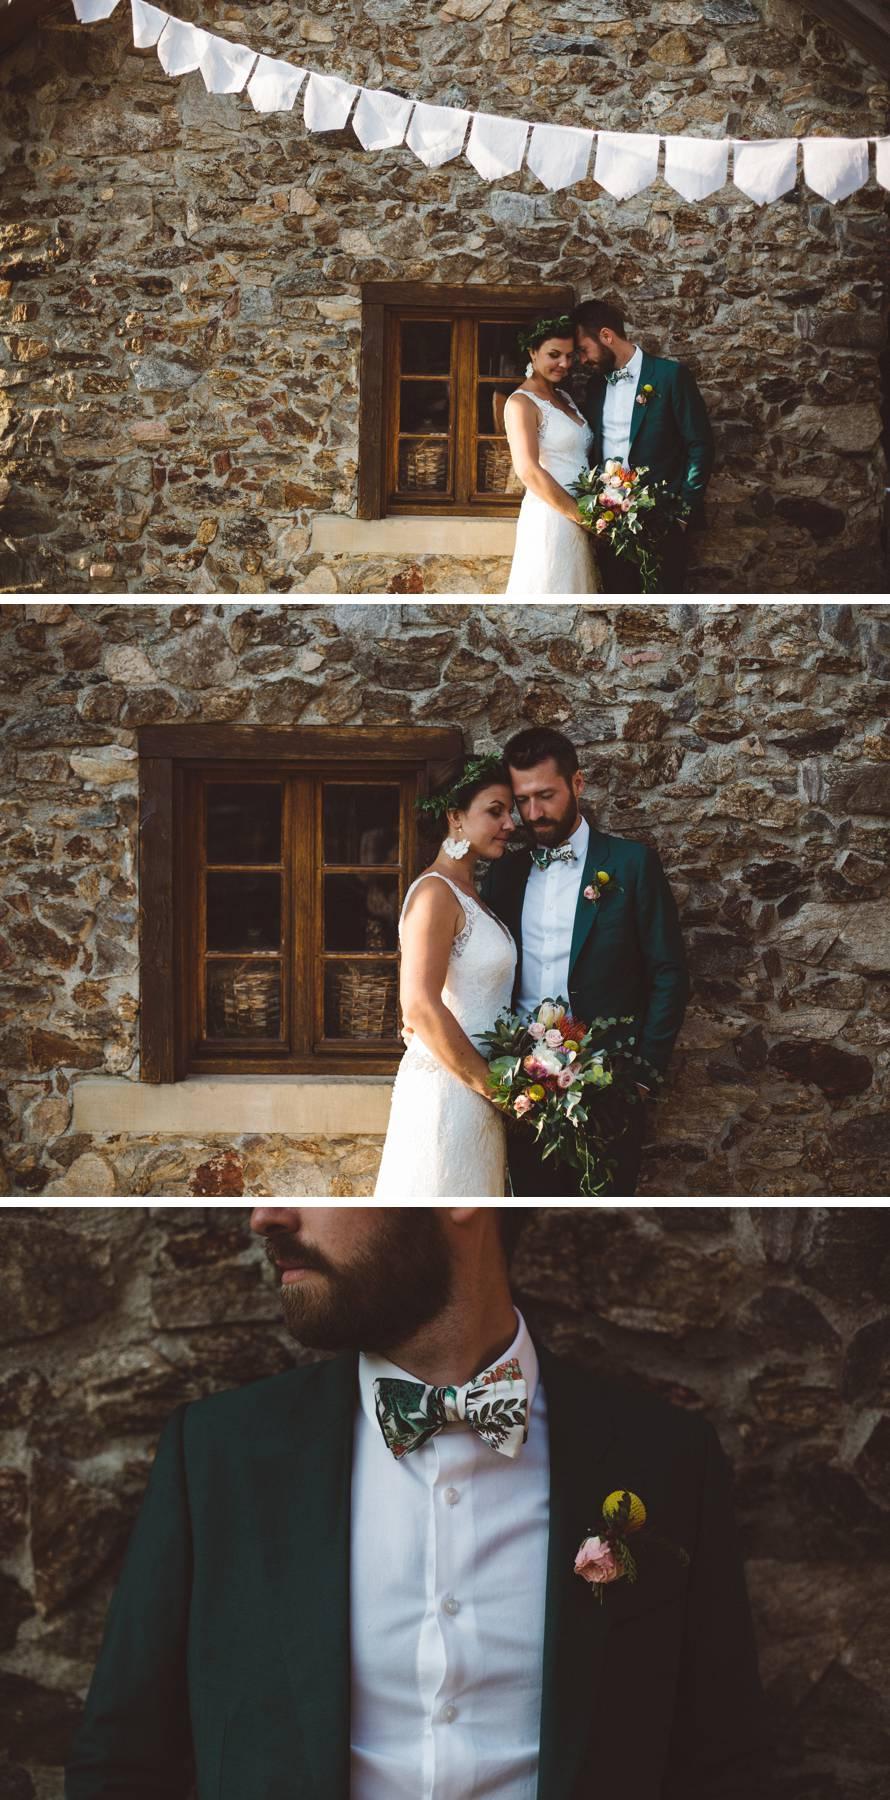 mariage-tropical-raben-horben_0026.jpg